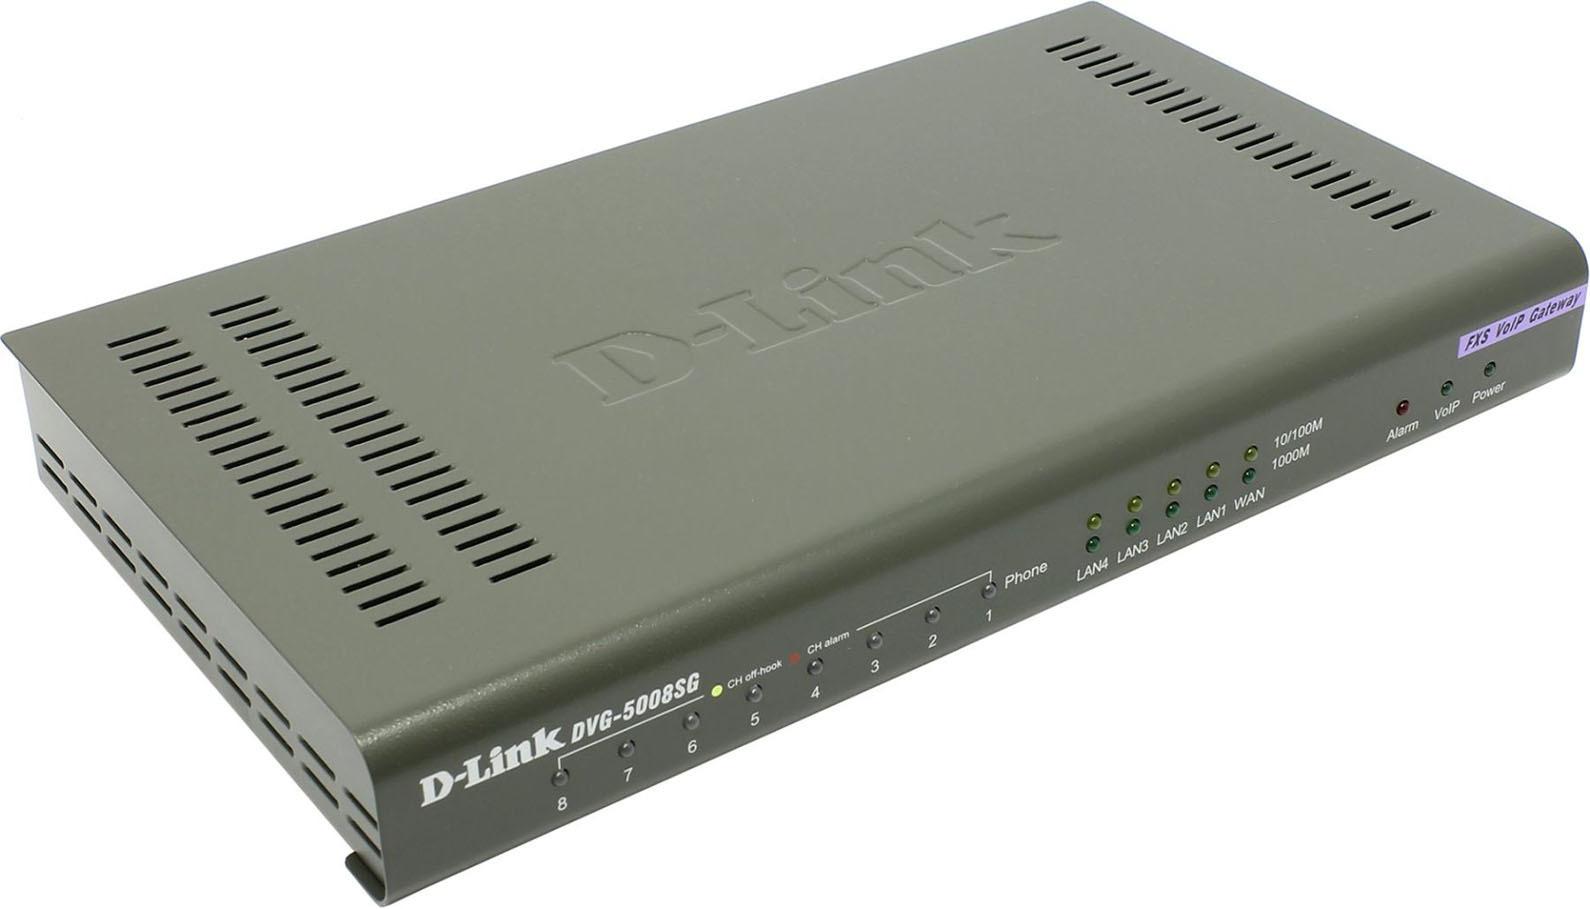 Шлюз D-Link, DVG-5008SG/A1A шлюз voip d link dvg 5008sg a1a 8xfxs rj 11 4xlan 1xwan 10 100mbps sip